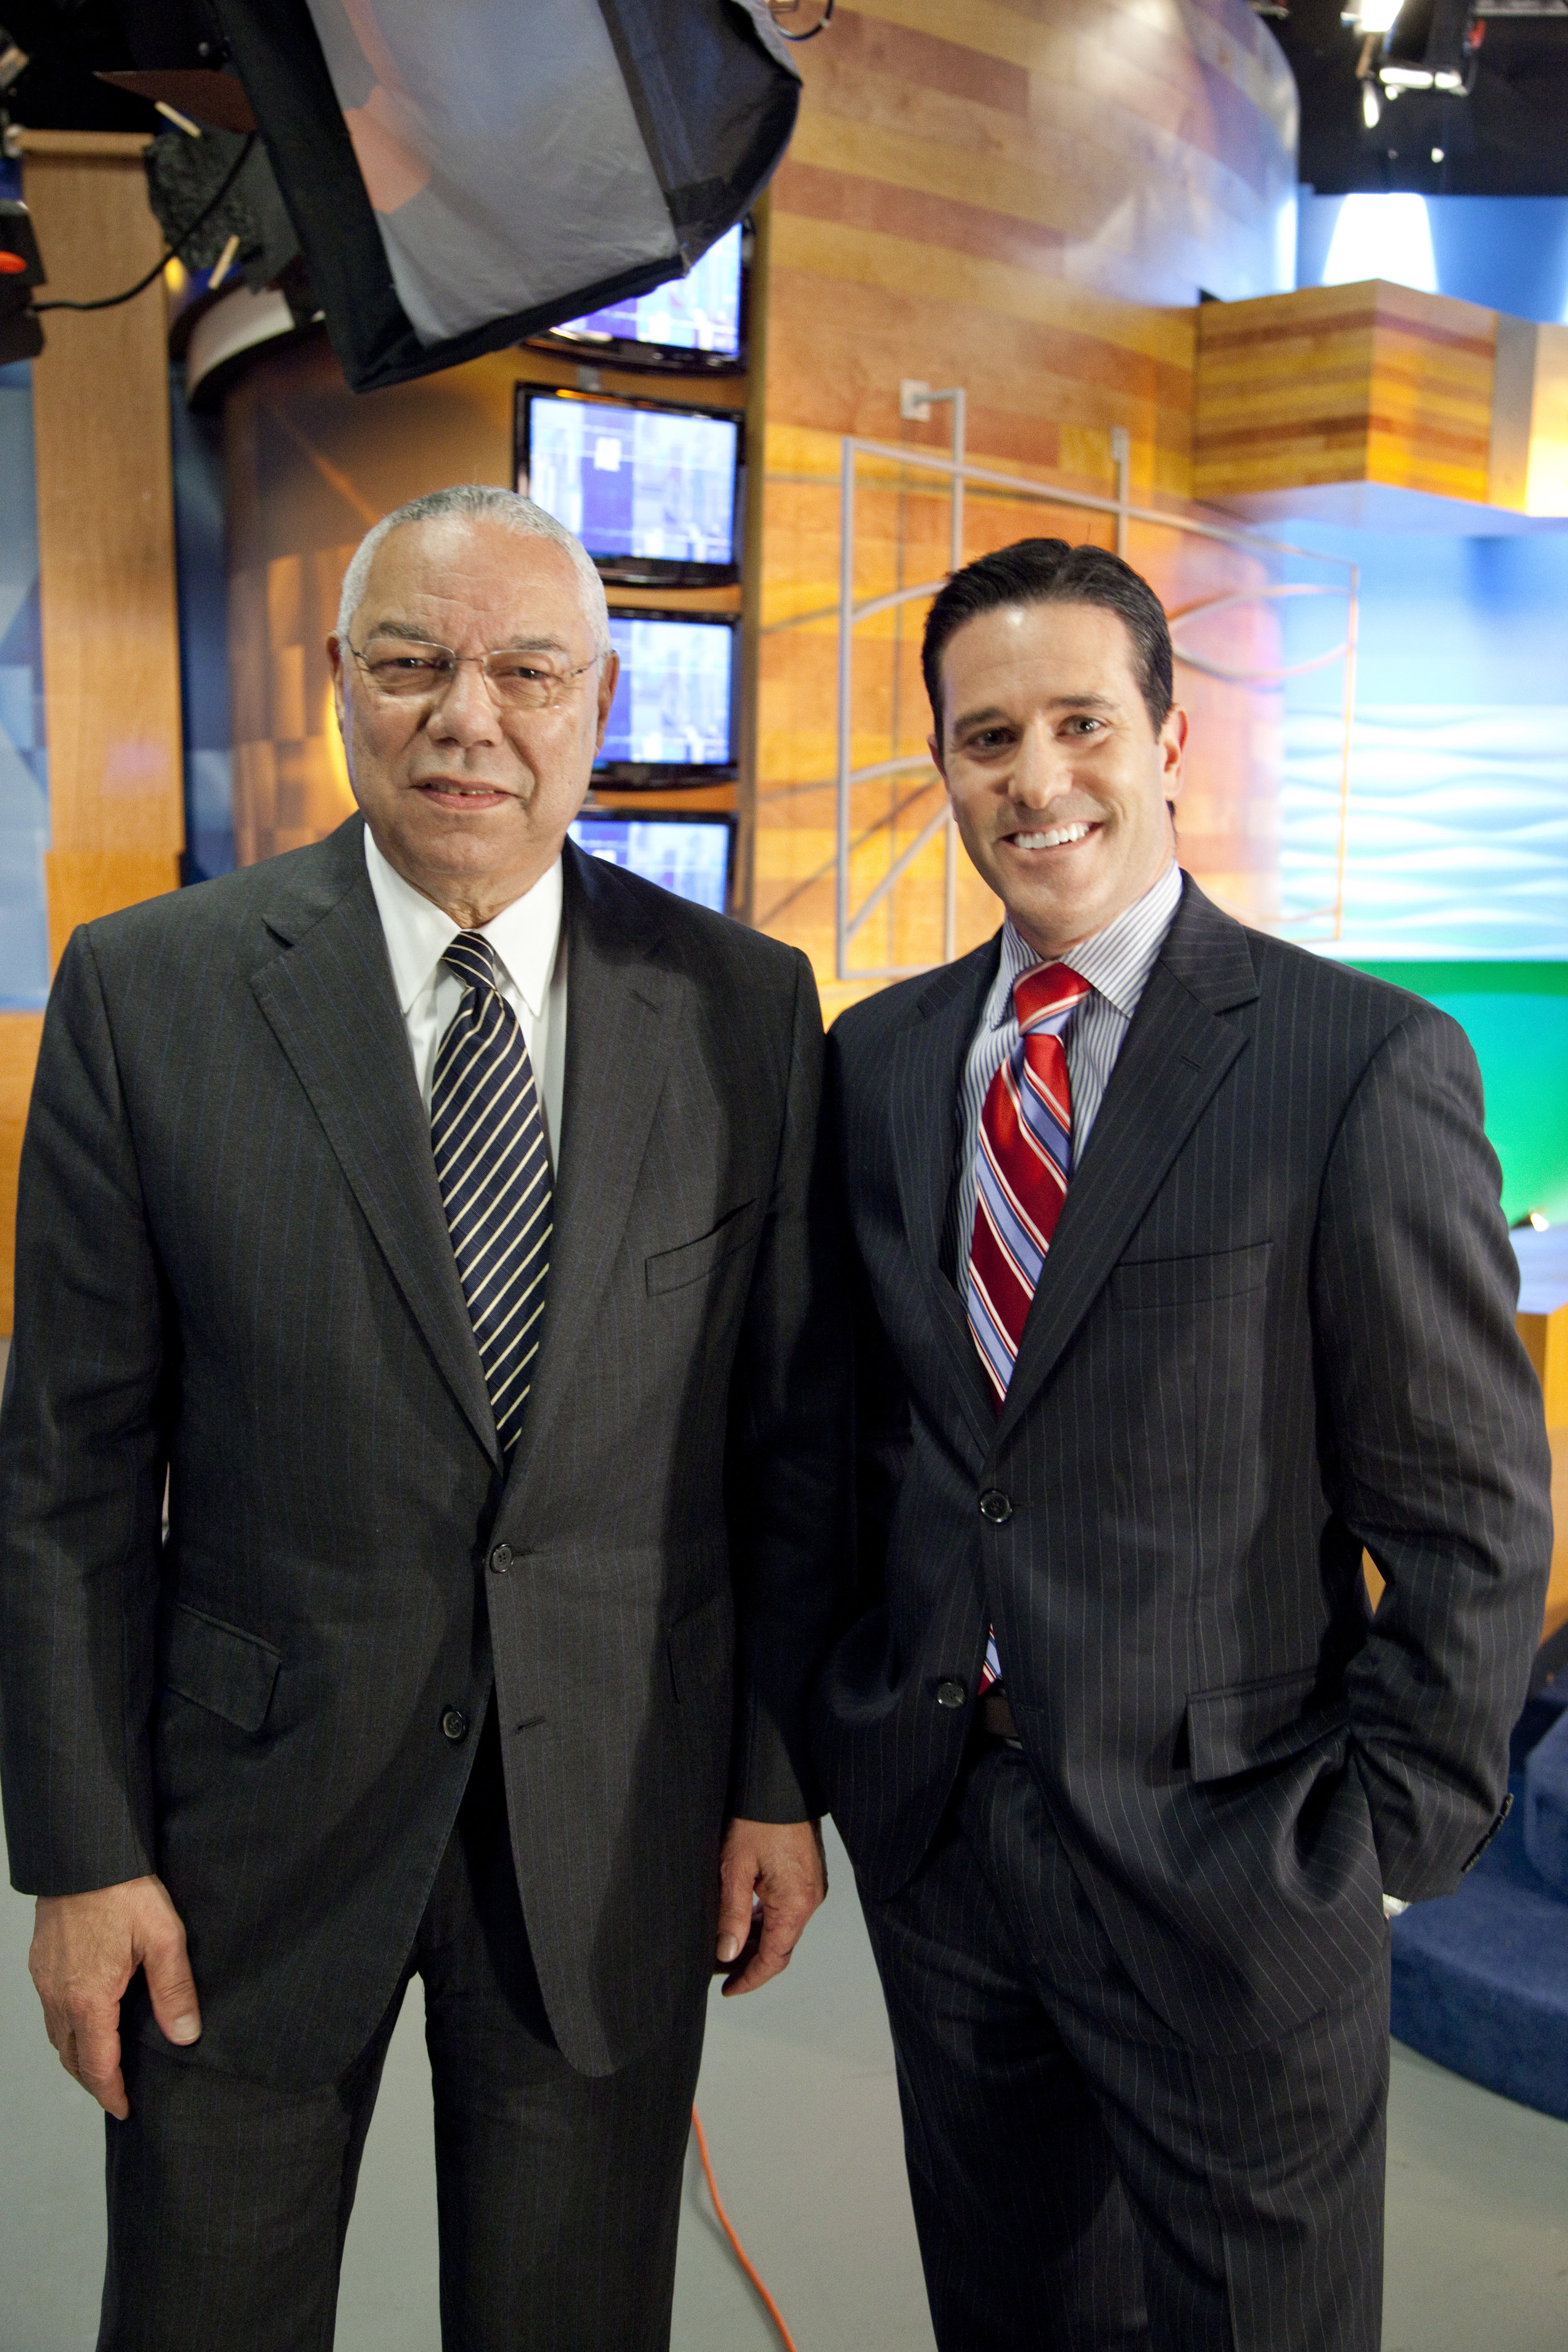 65th U.S. Sec. of State, Gen. Colin Powell